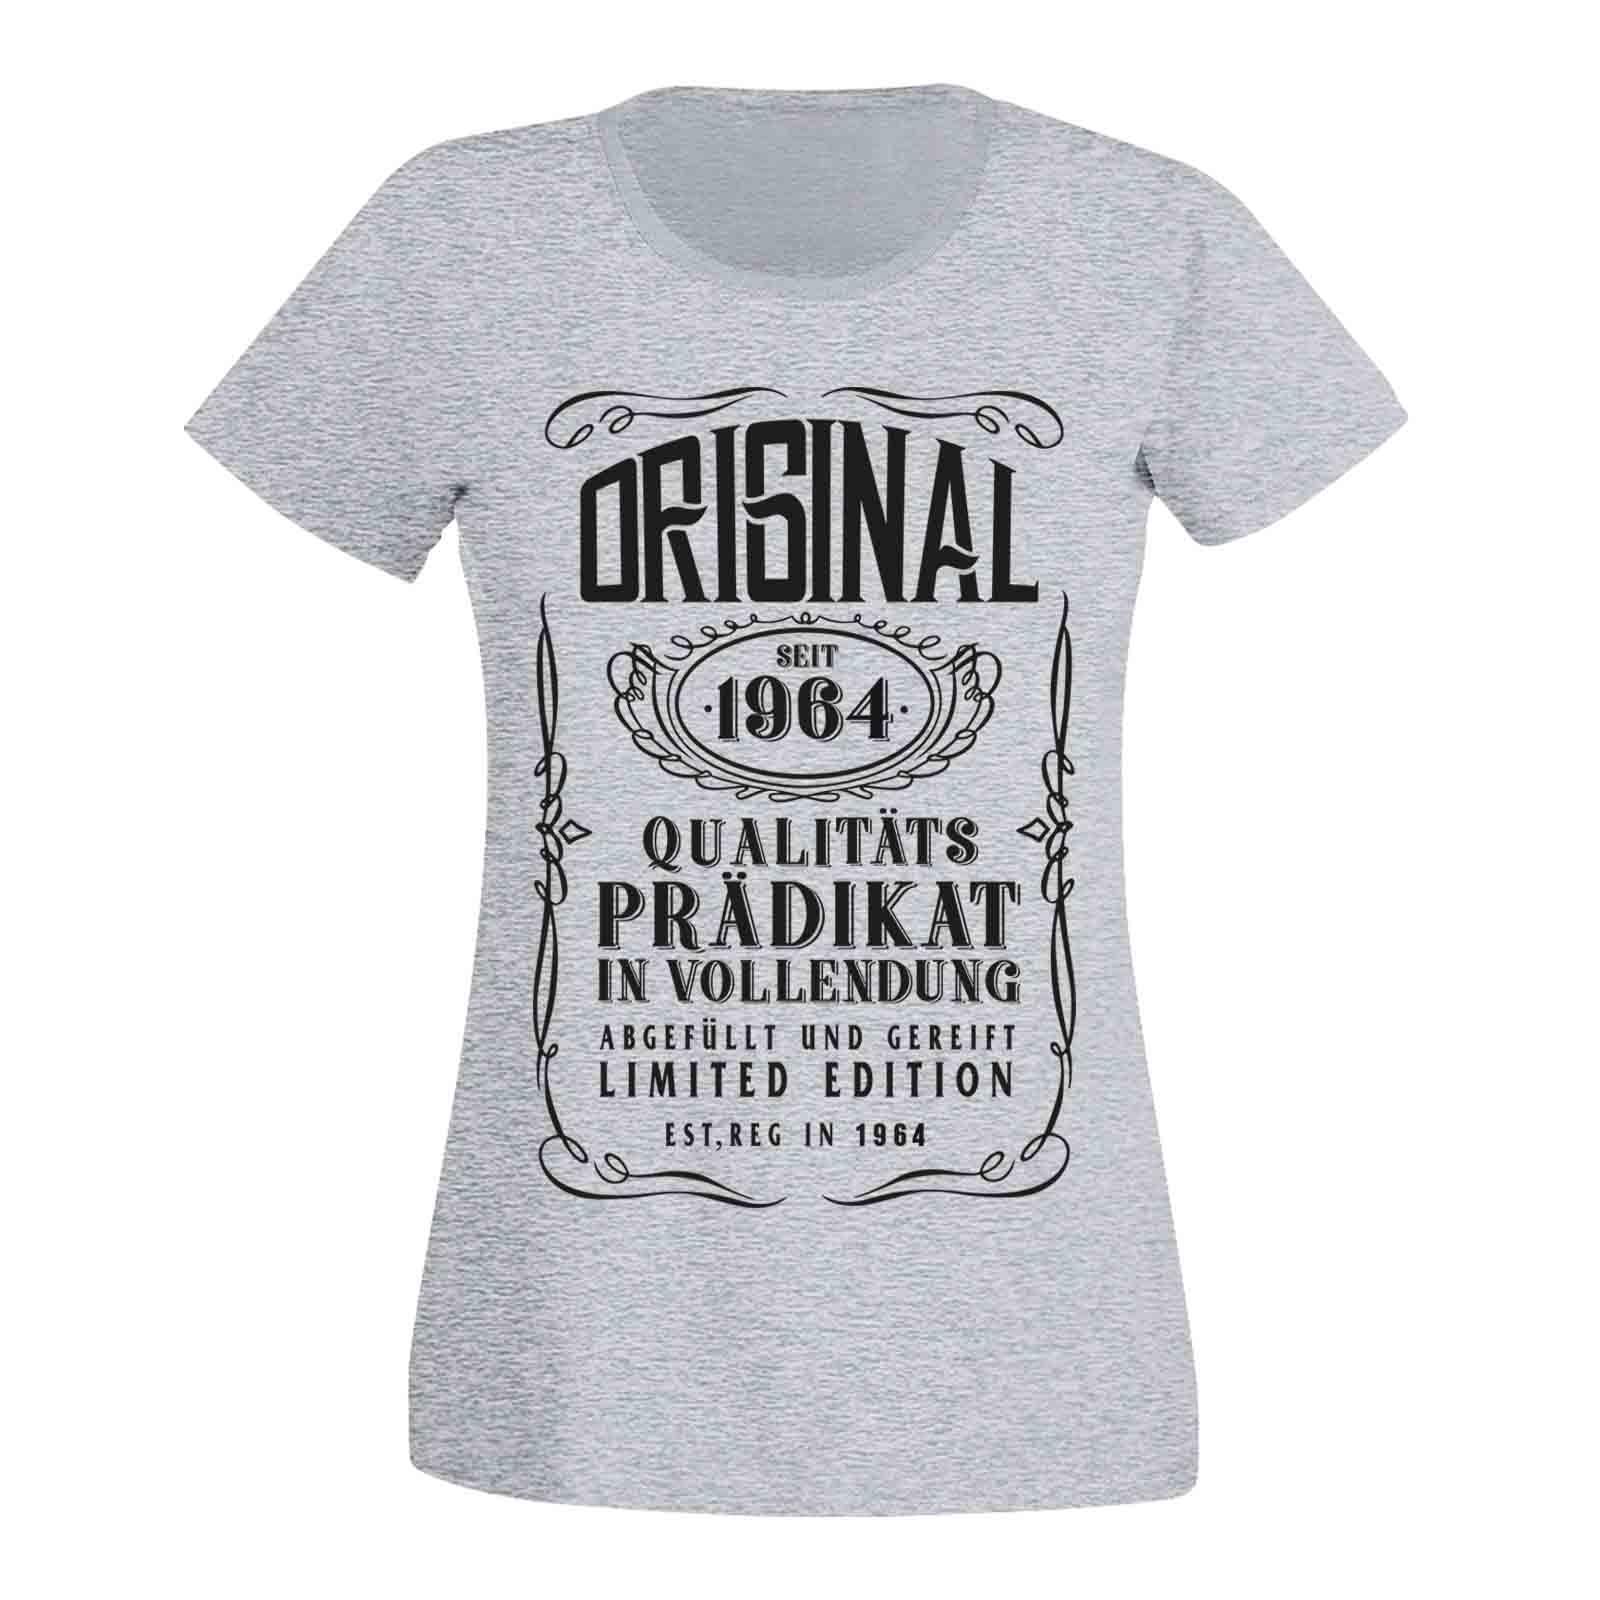 Full Size of Sprüche T Shirt Mister Lady Apres Ski Sprüche T Shirt Vegane Sprüche T Shirt Karneval Sprüche T Shirt Küche Sprüche T Shirt